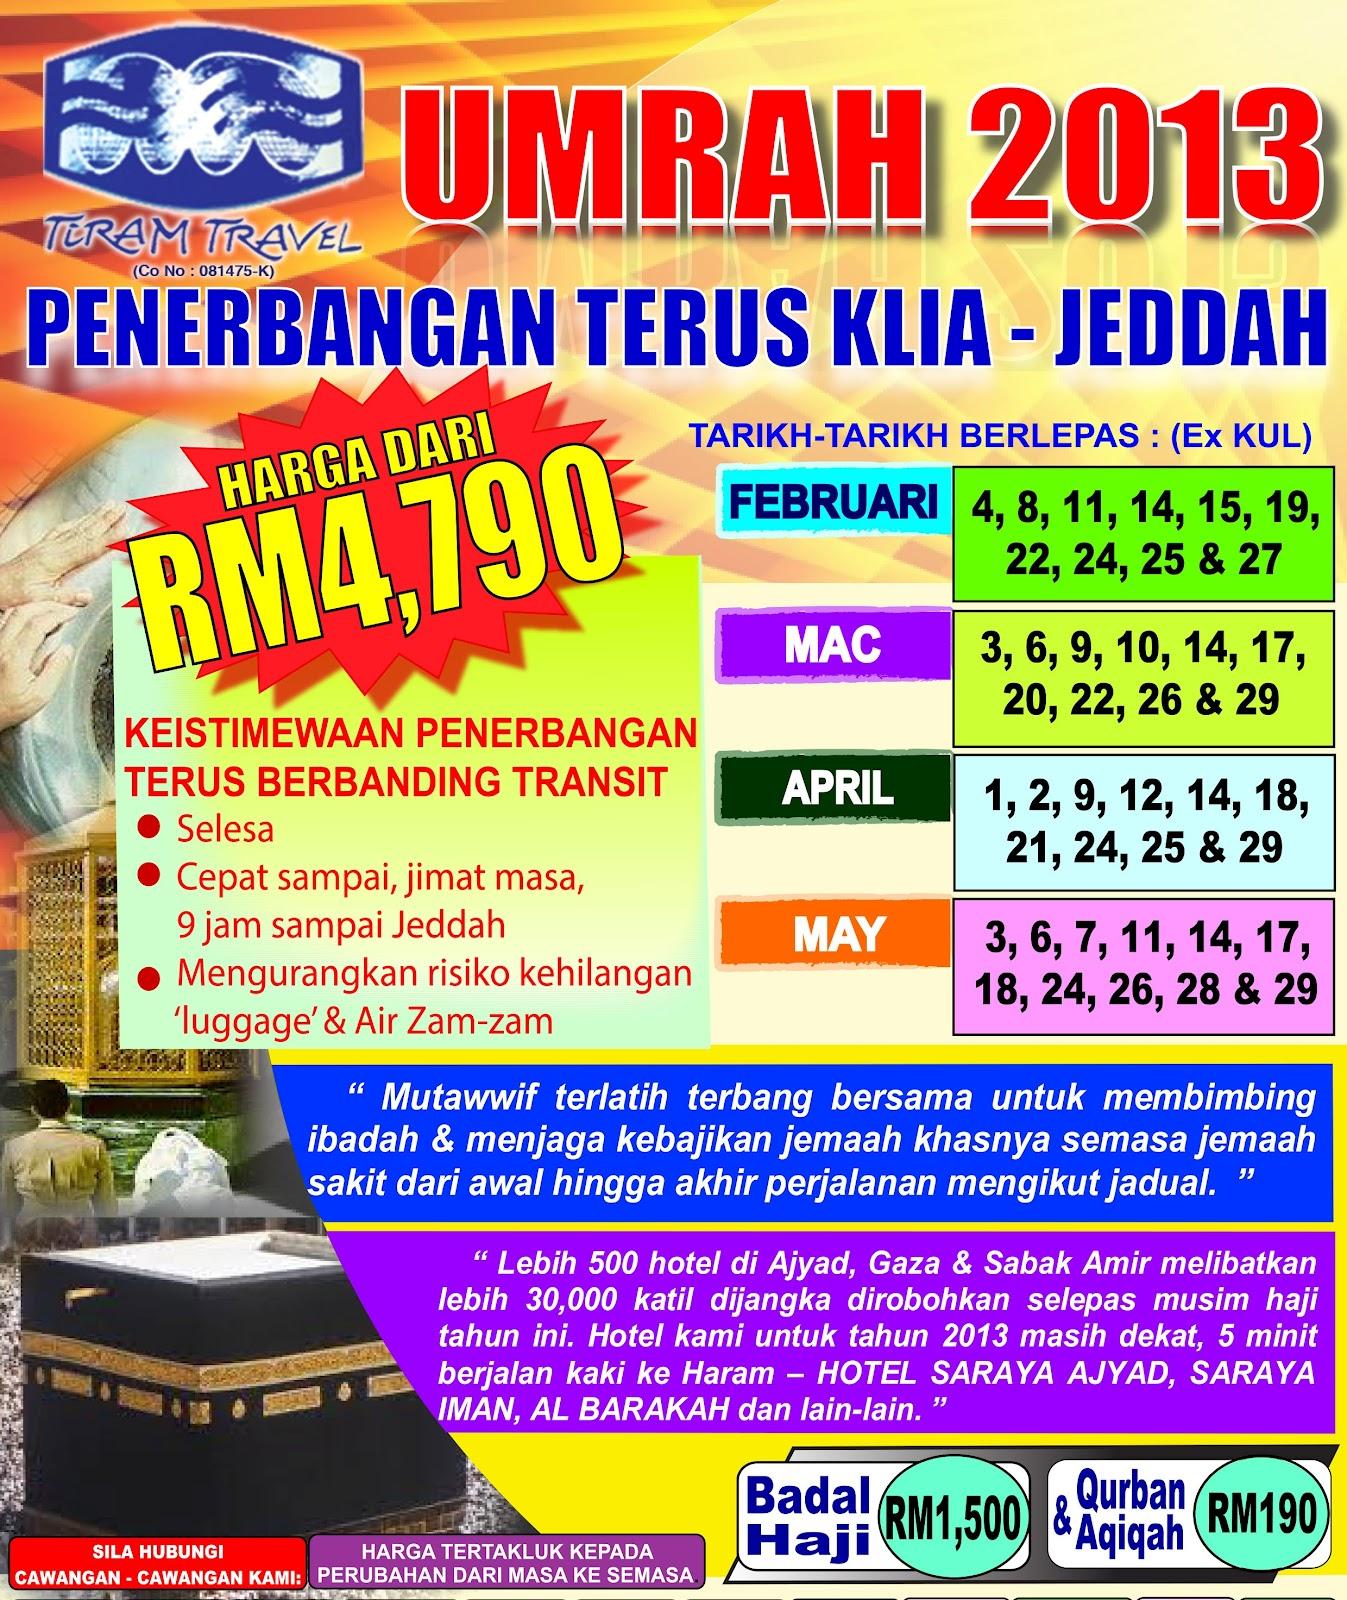 Syoknya Umrah bersama Tiram Travel - Haji, Umrah & Ziarah